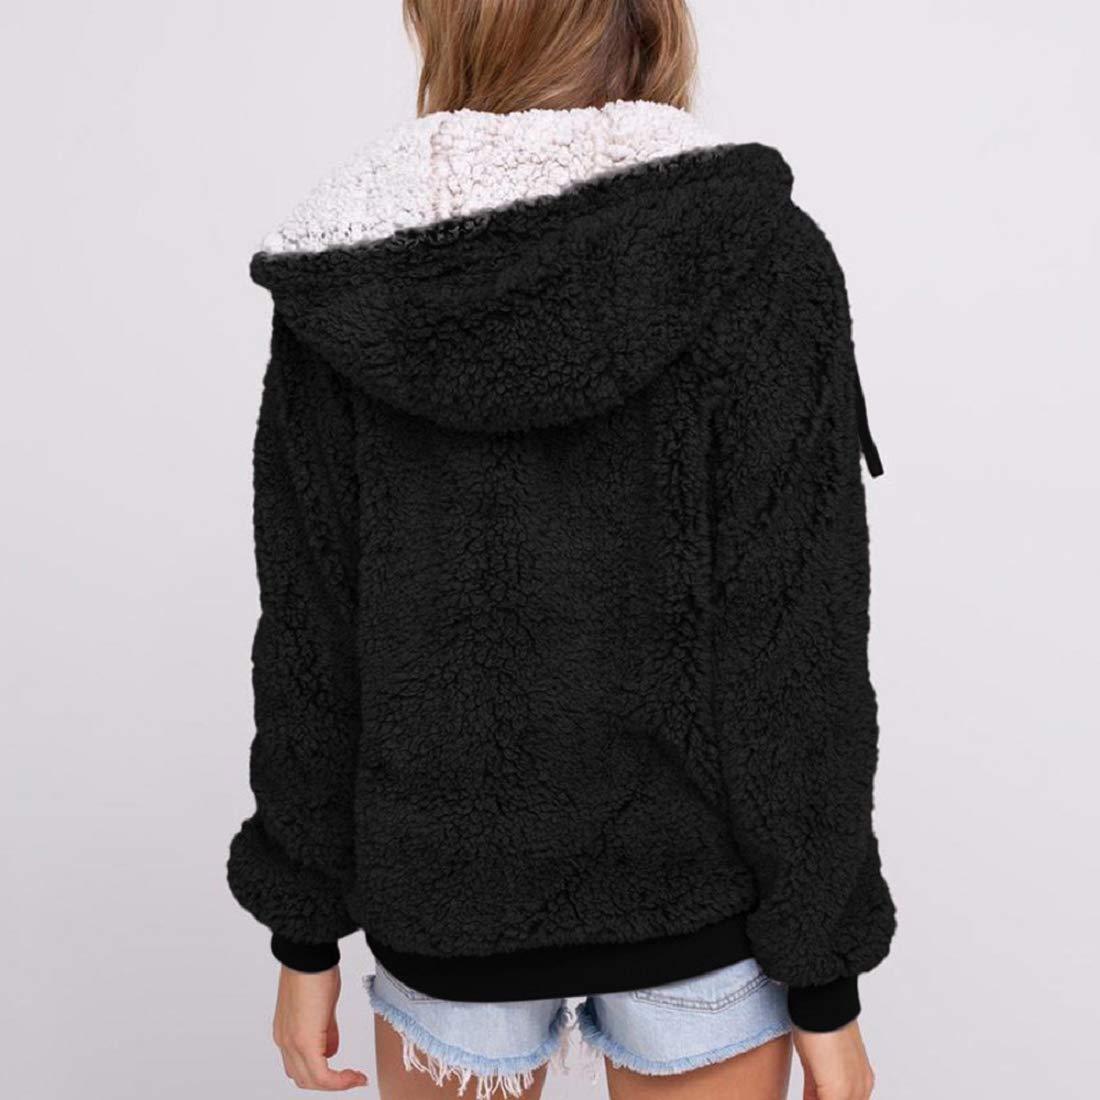 GONKOMA Womens Hooded Coat Winter Parka Zip Up Outwear Cardigan Long Sleeve Sweater Coat with Pocket